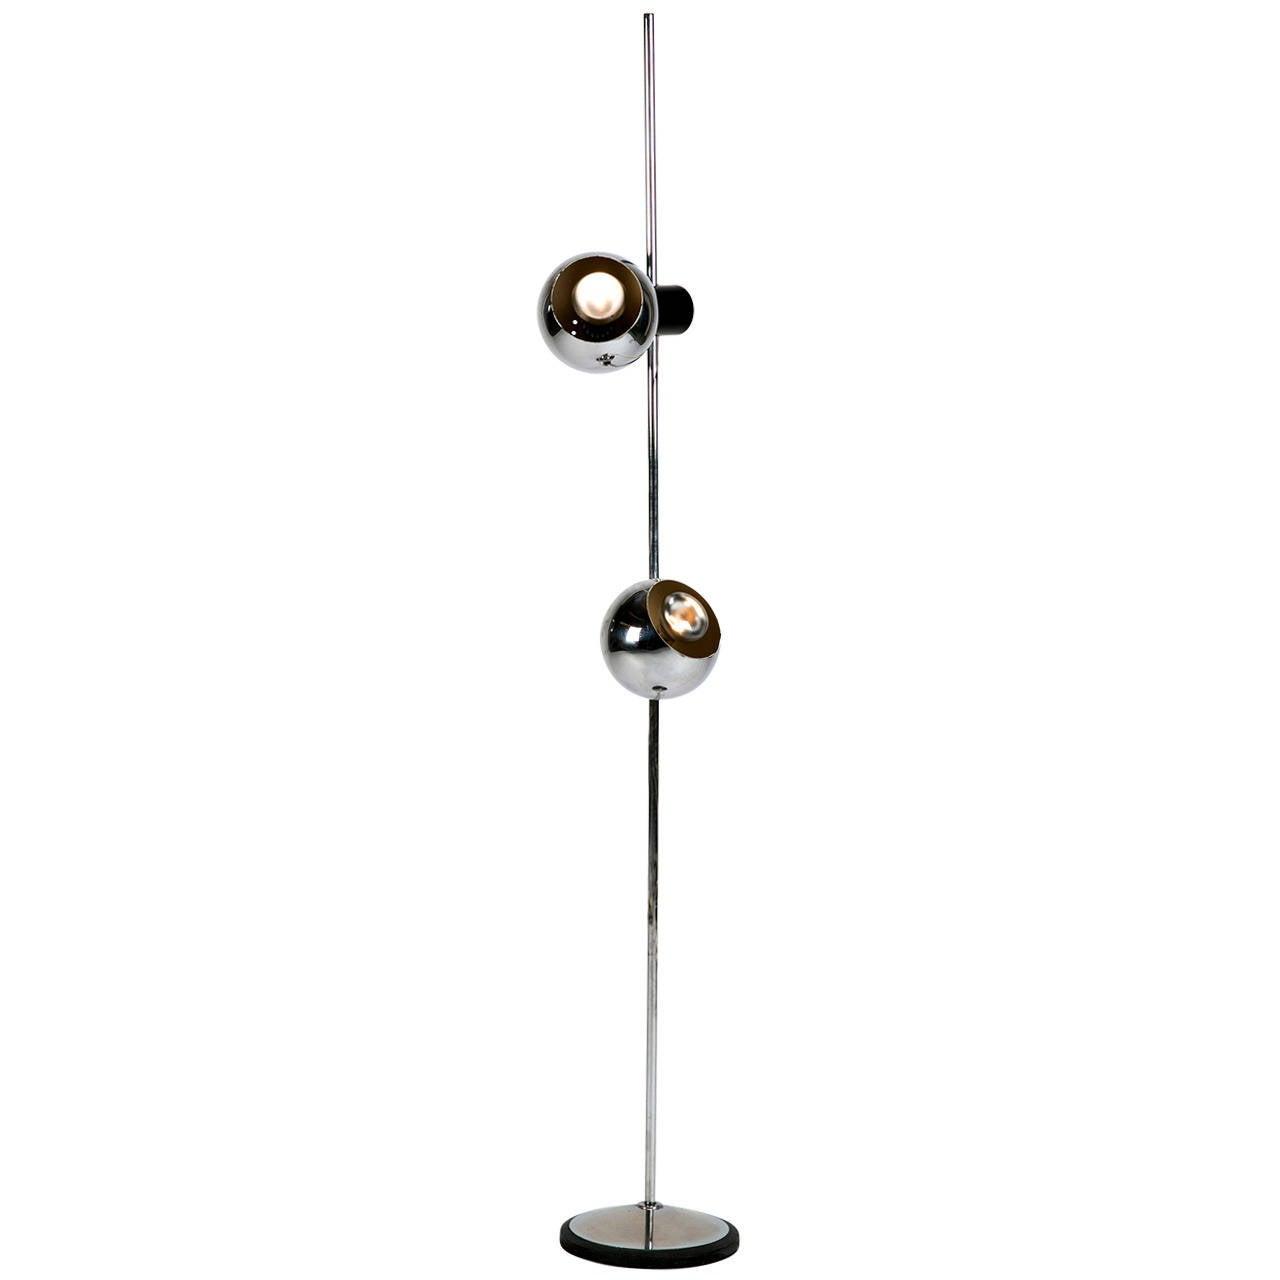 Italian chrome spots floor lamp by reggiani italy 60s at for Reggiani chrome floor lamp